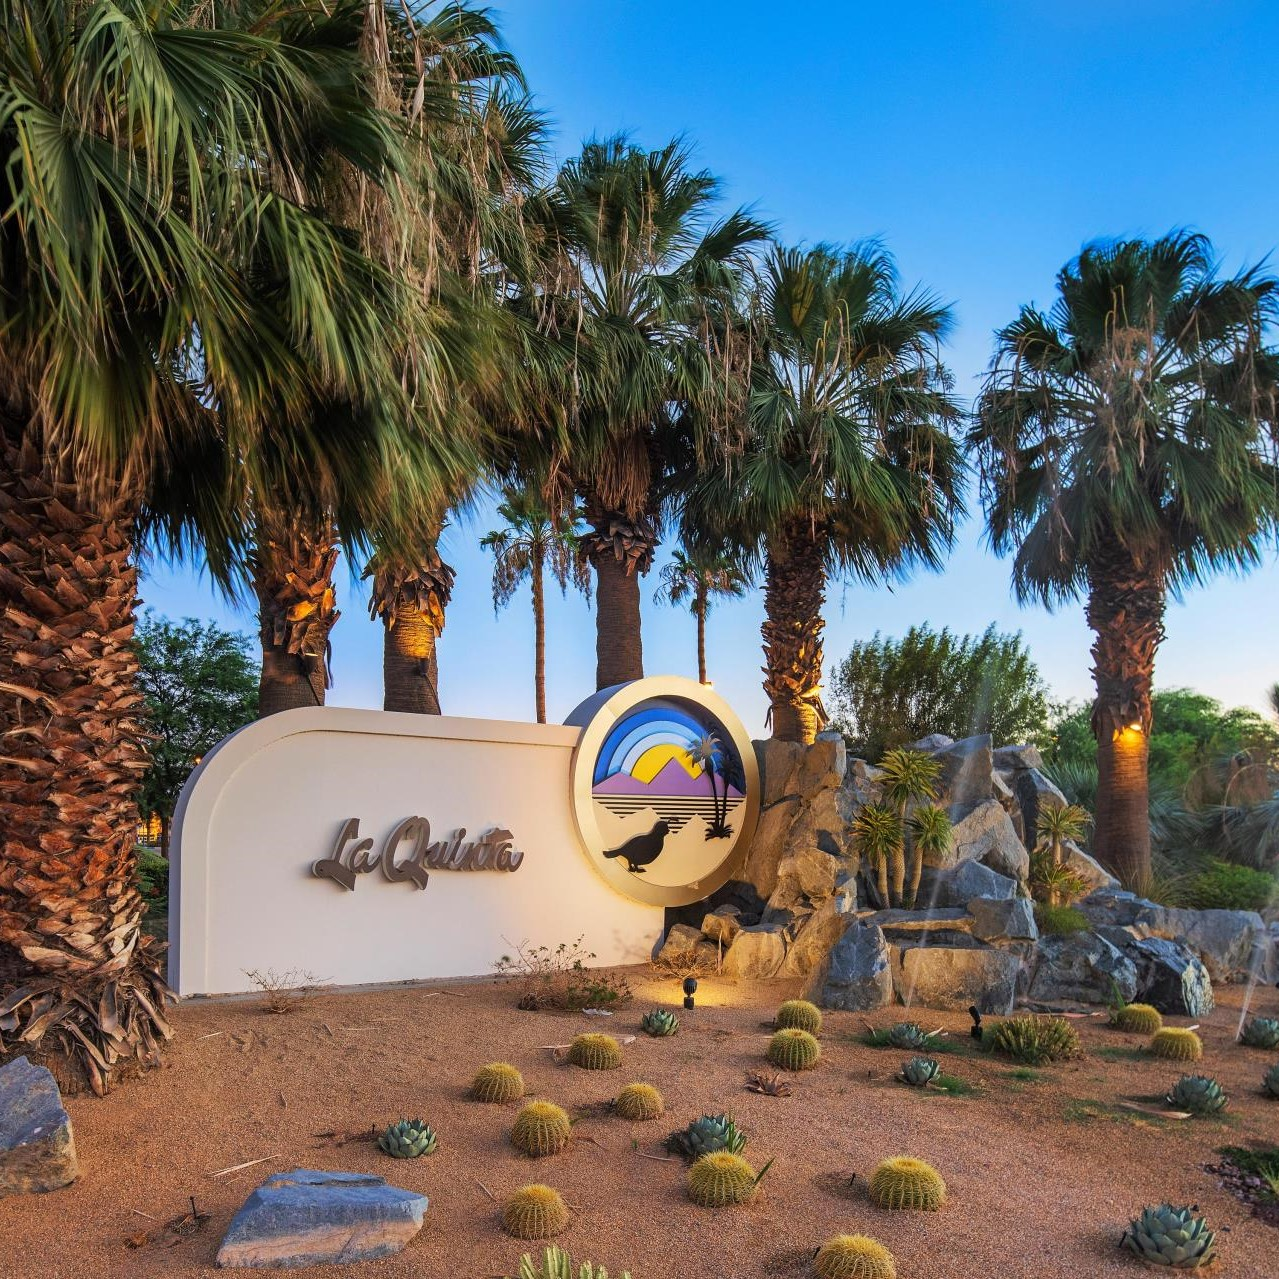 3. La Quinta community image